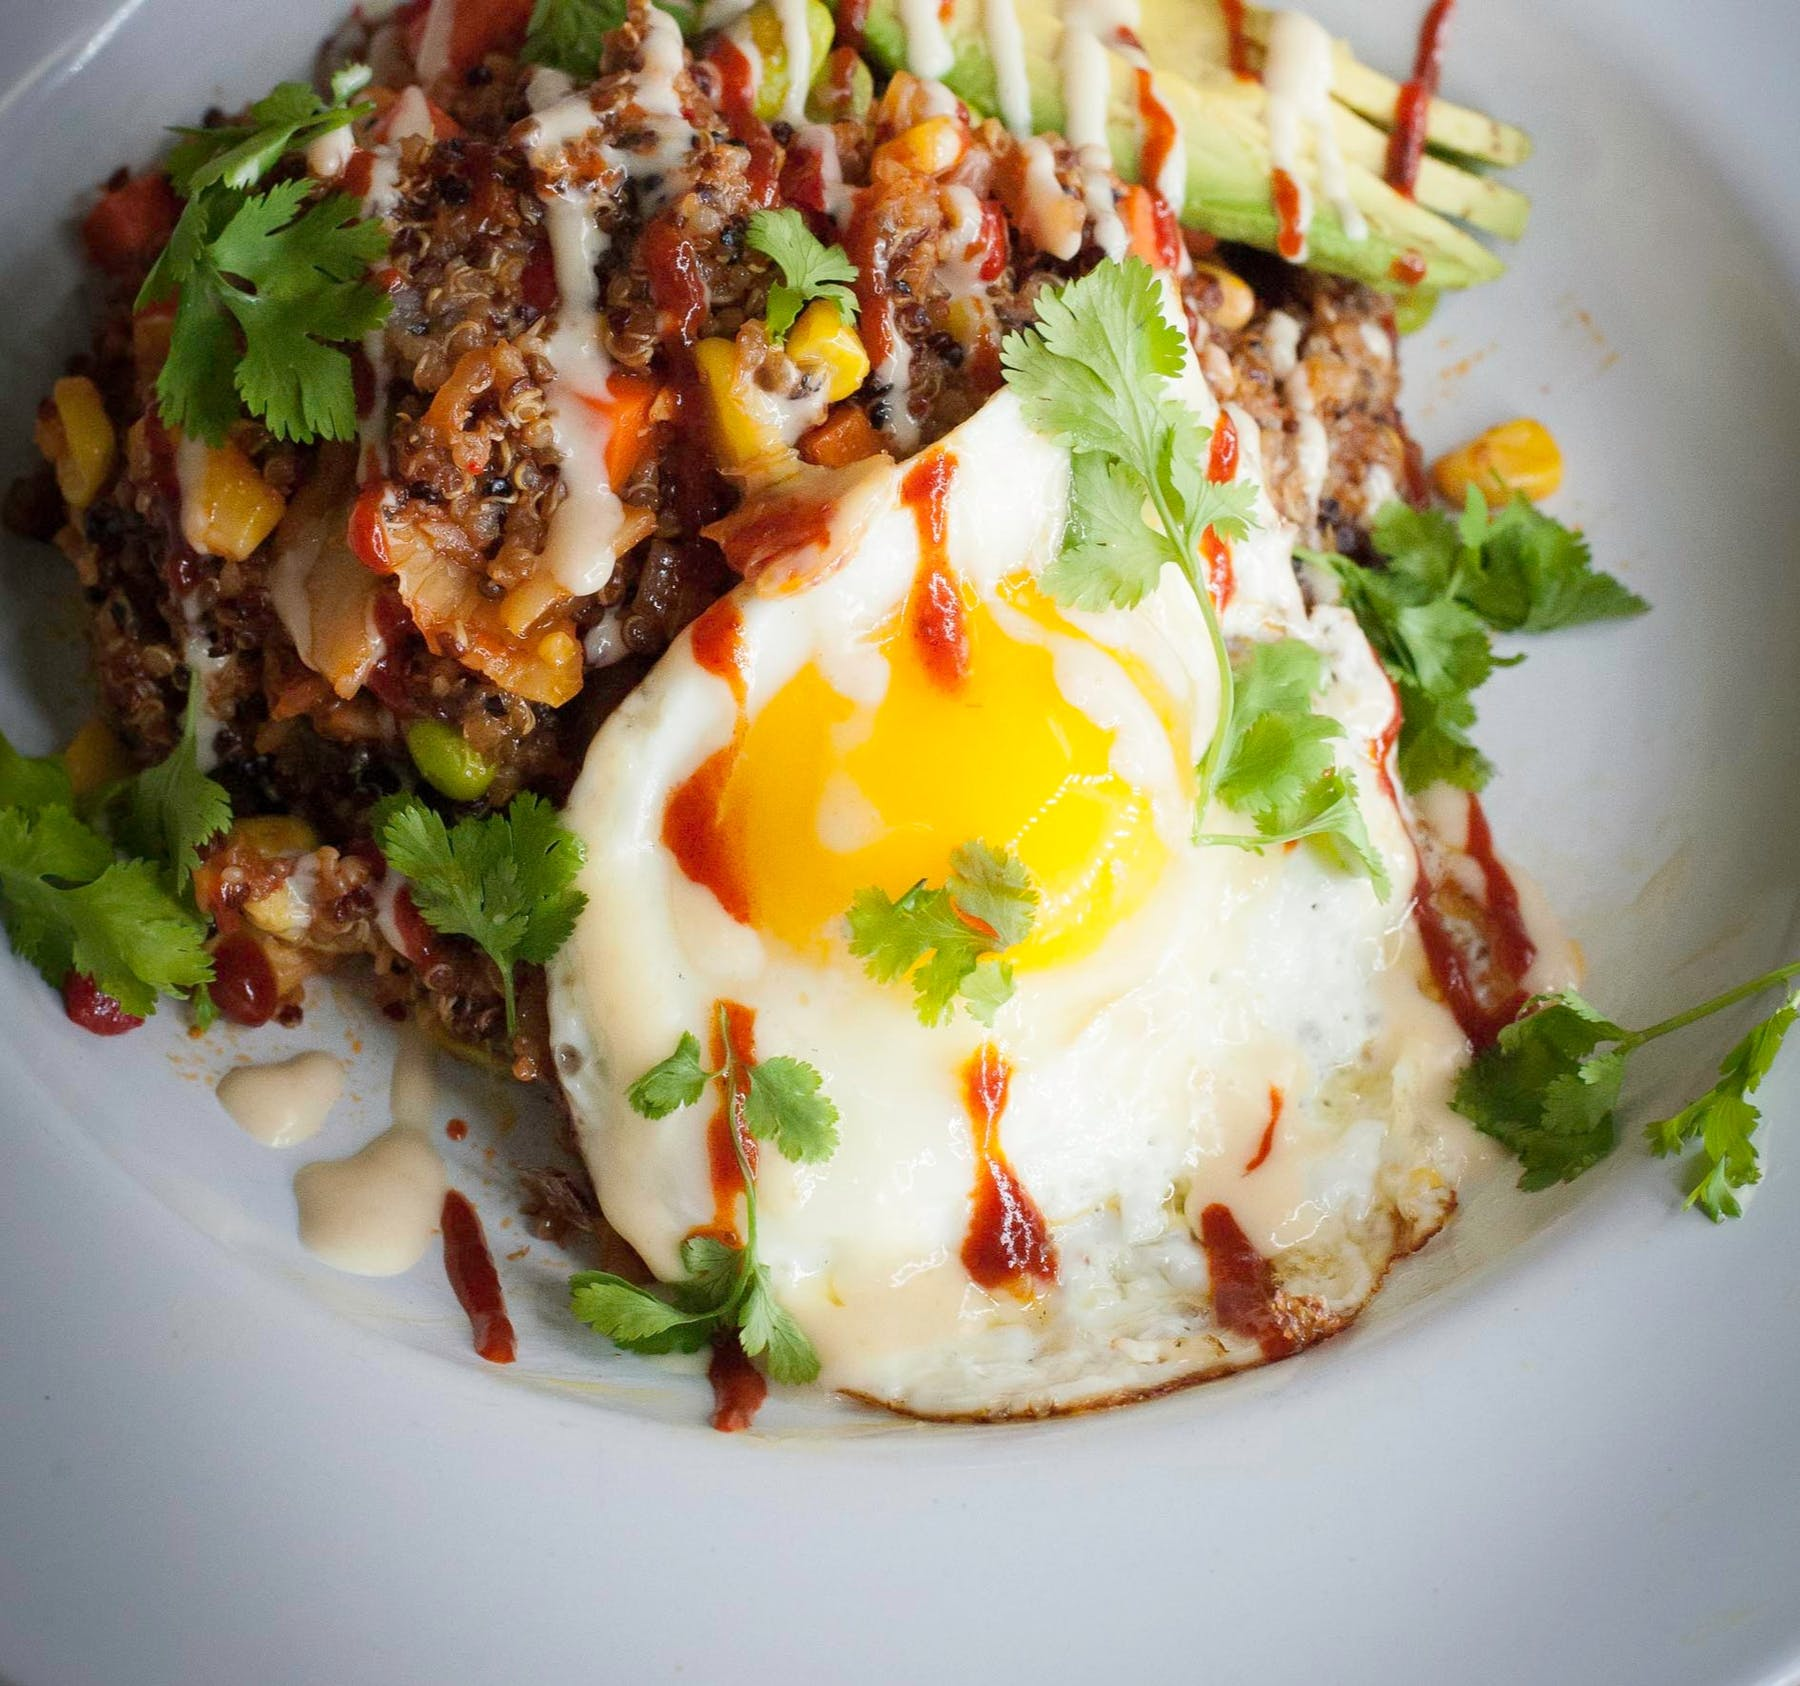 Kimchee Chia Quinoa Stir-Fry